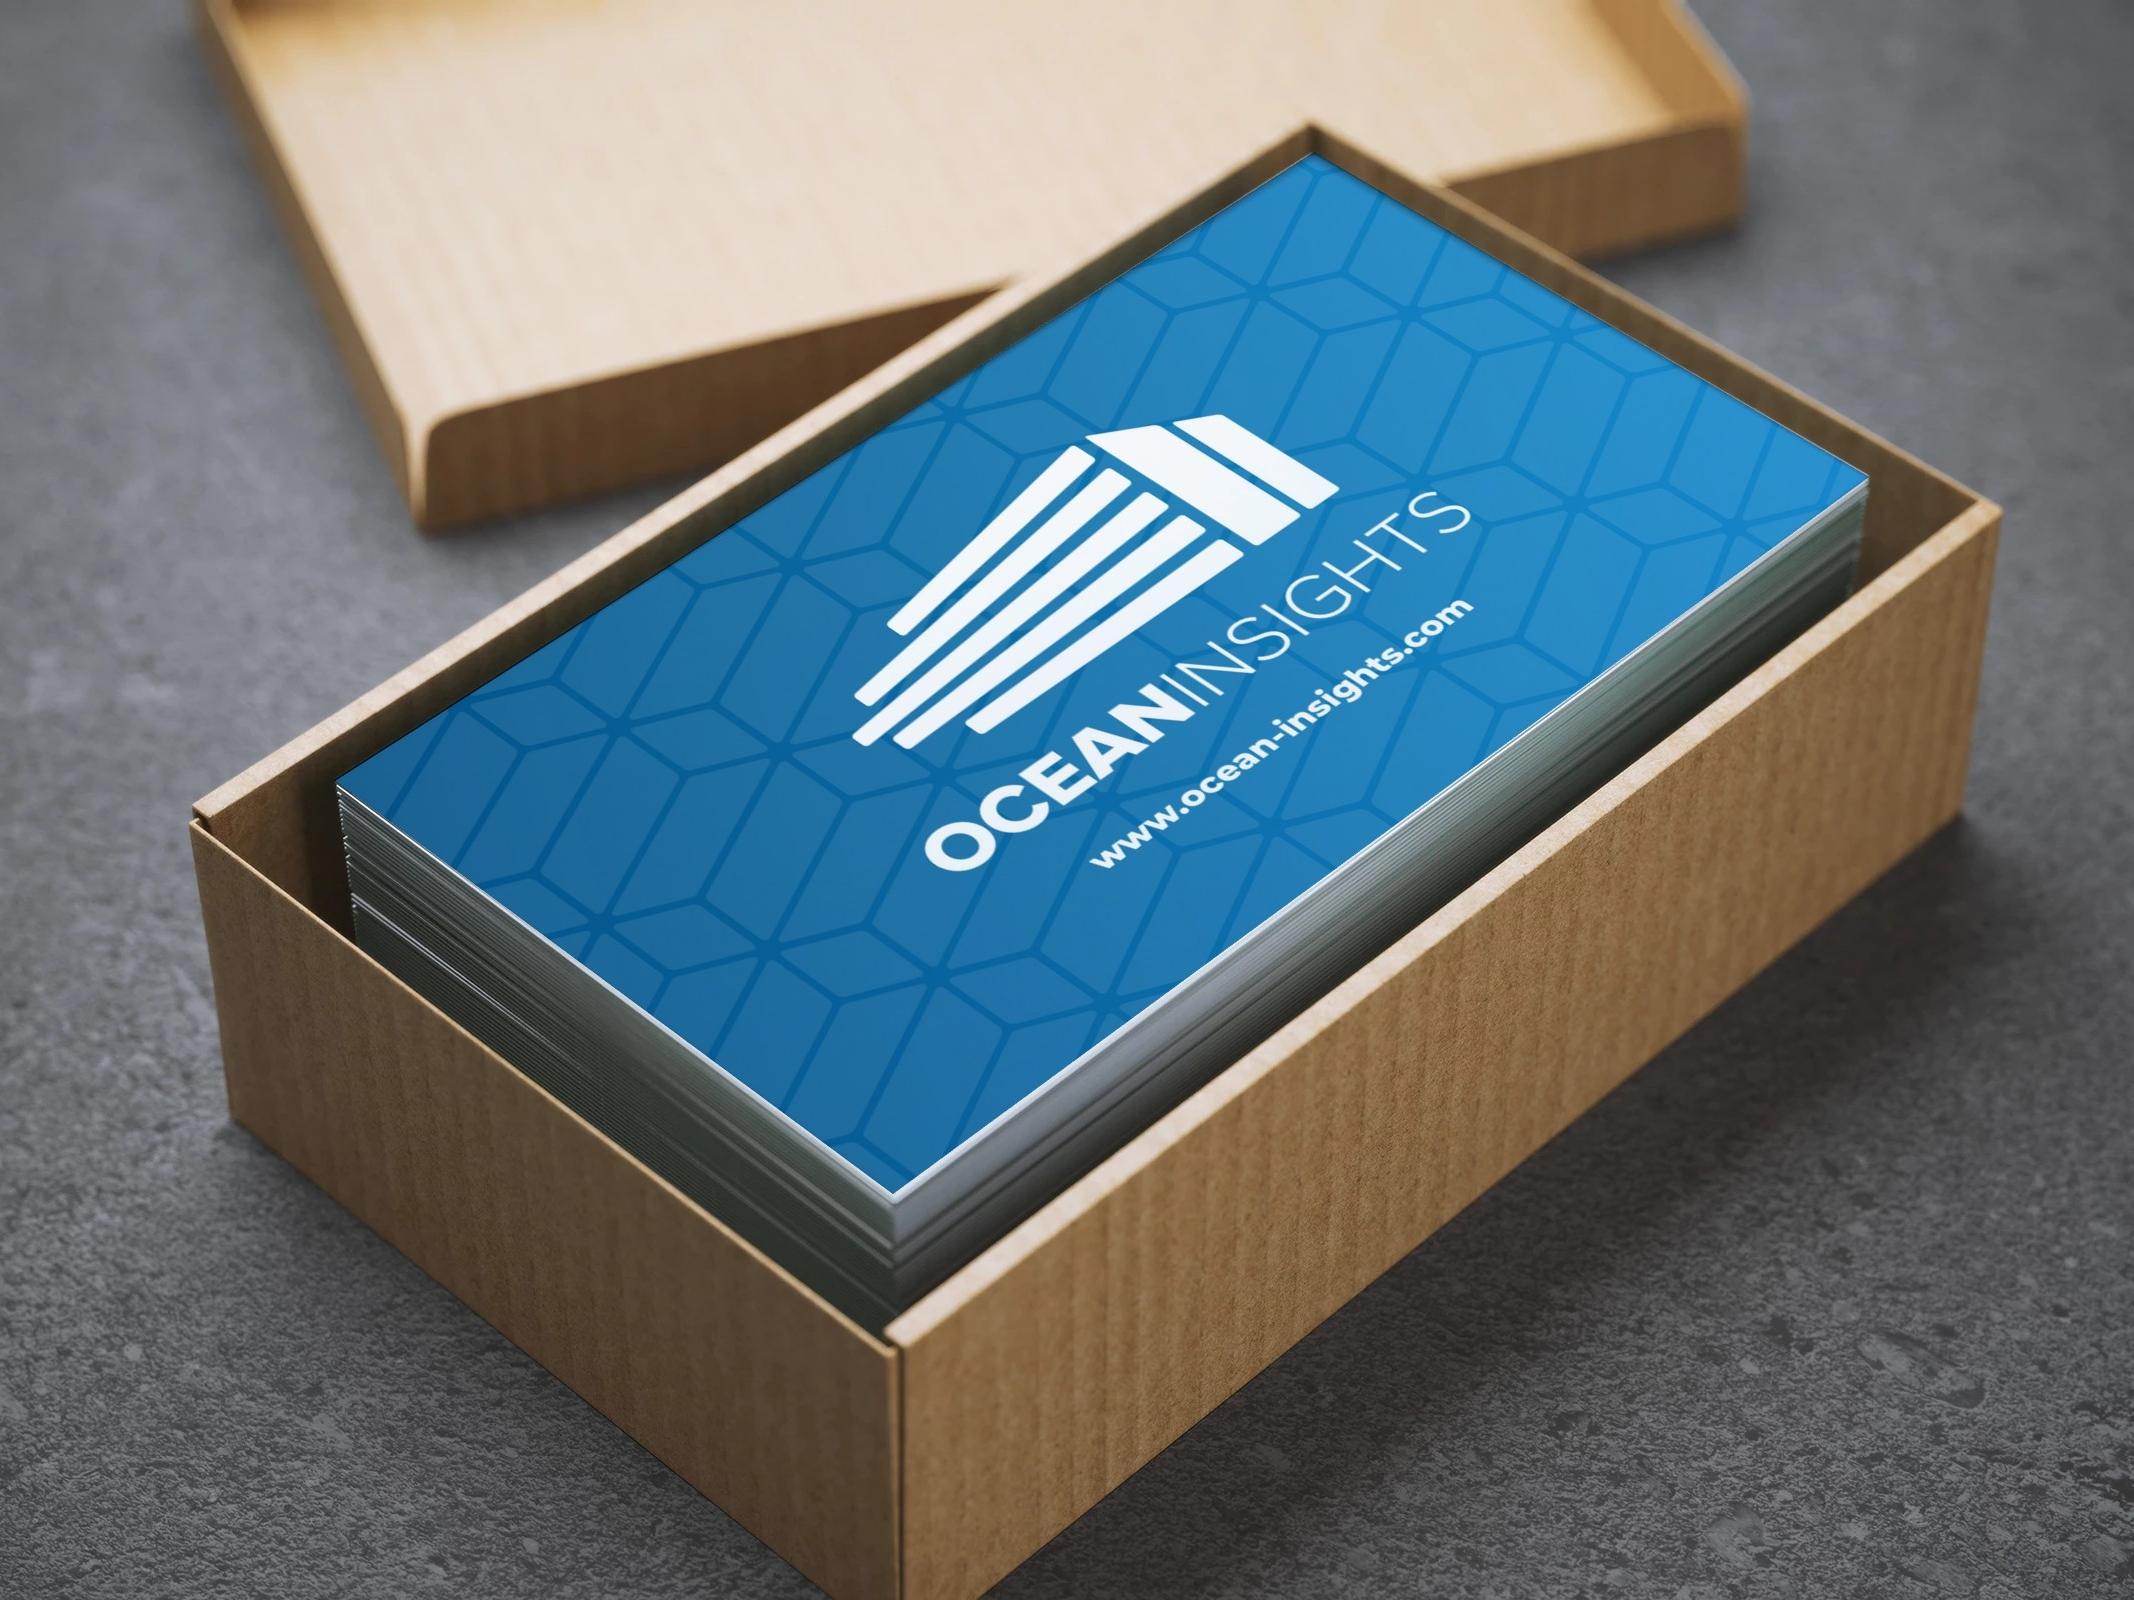 Business Card Design (2019's reBrand)